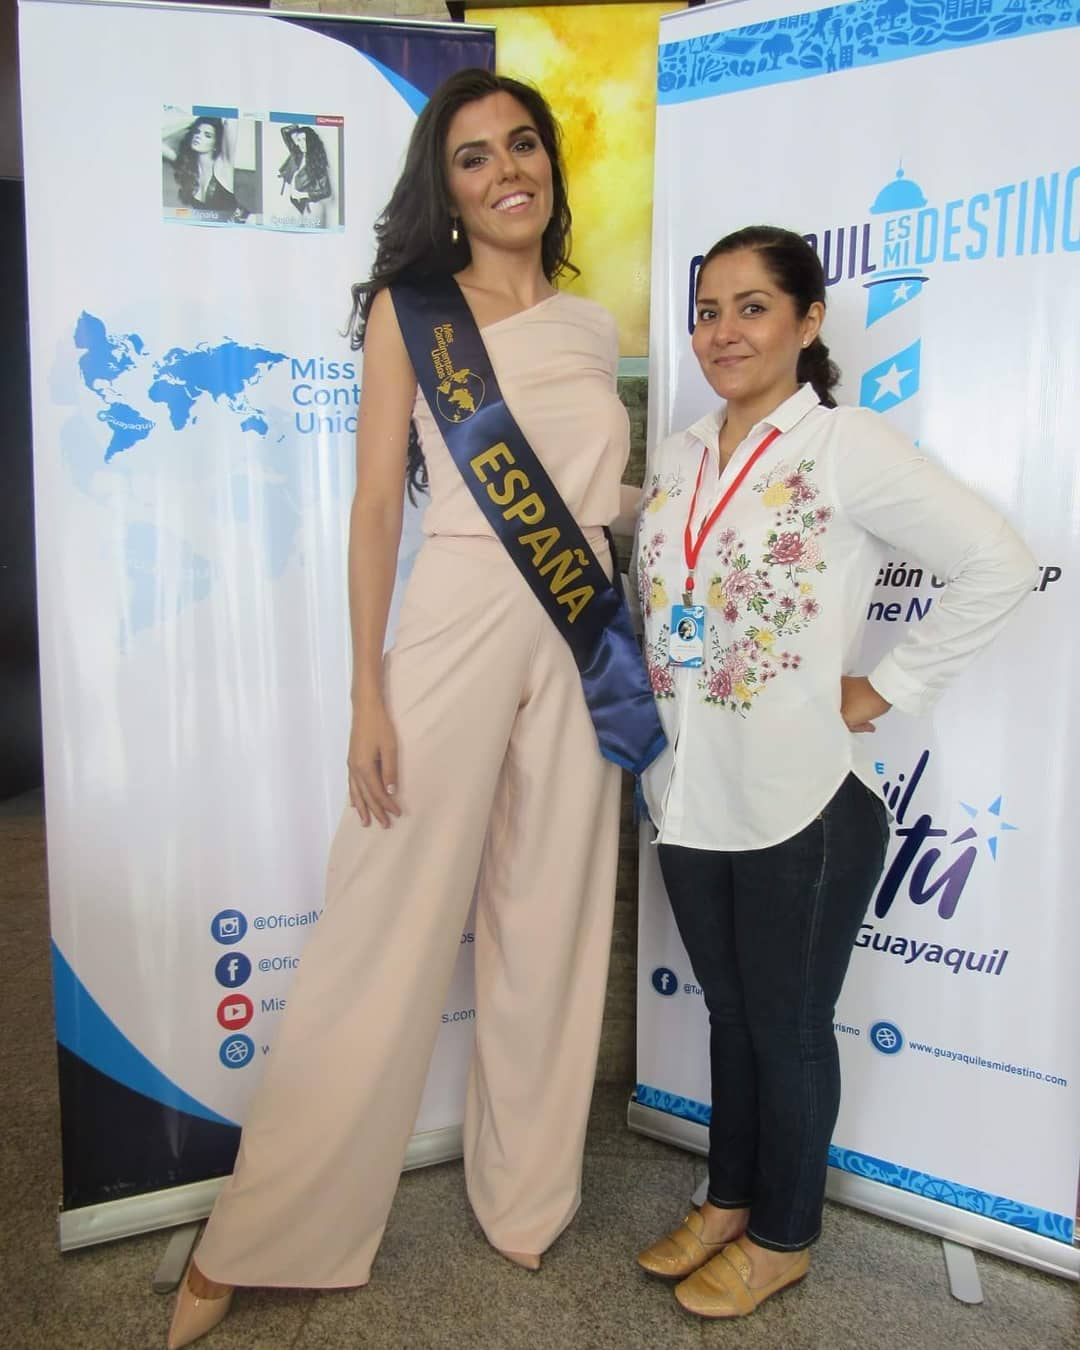 cynthia ruz lopez escobar, 3rd runner-up de miss continentes unidos 2018. - Página 2 38923010